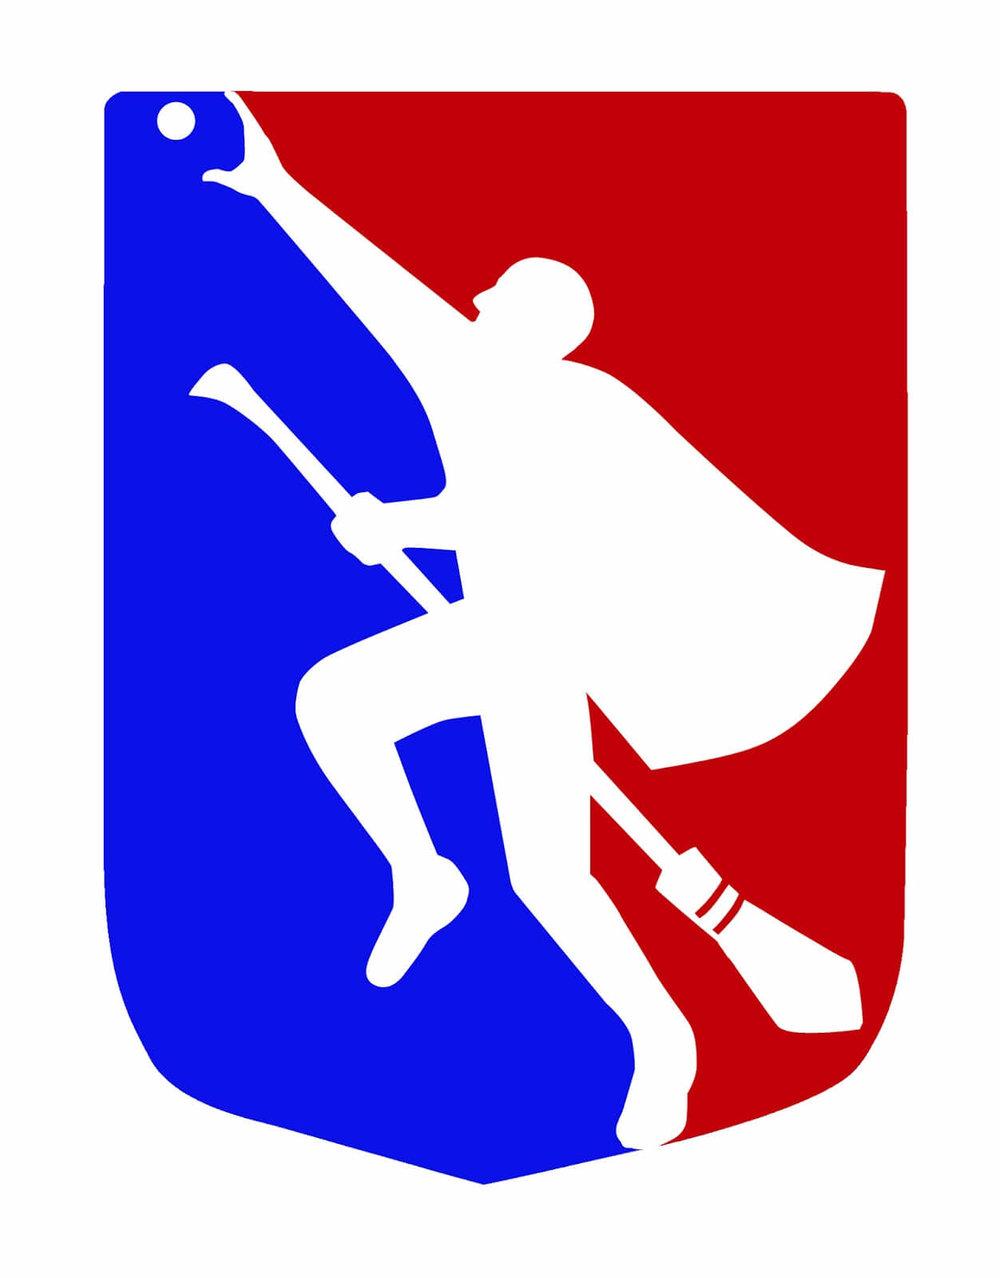 iqa-logo-quidditch.jpg